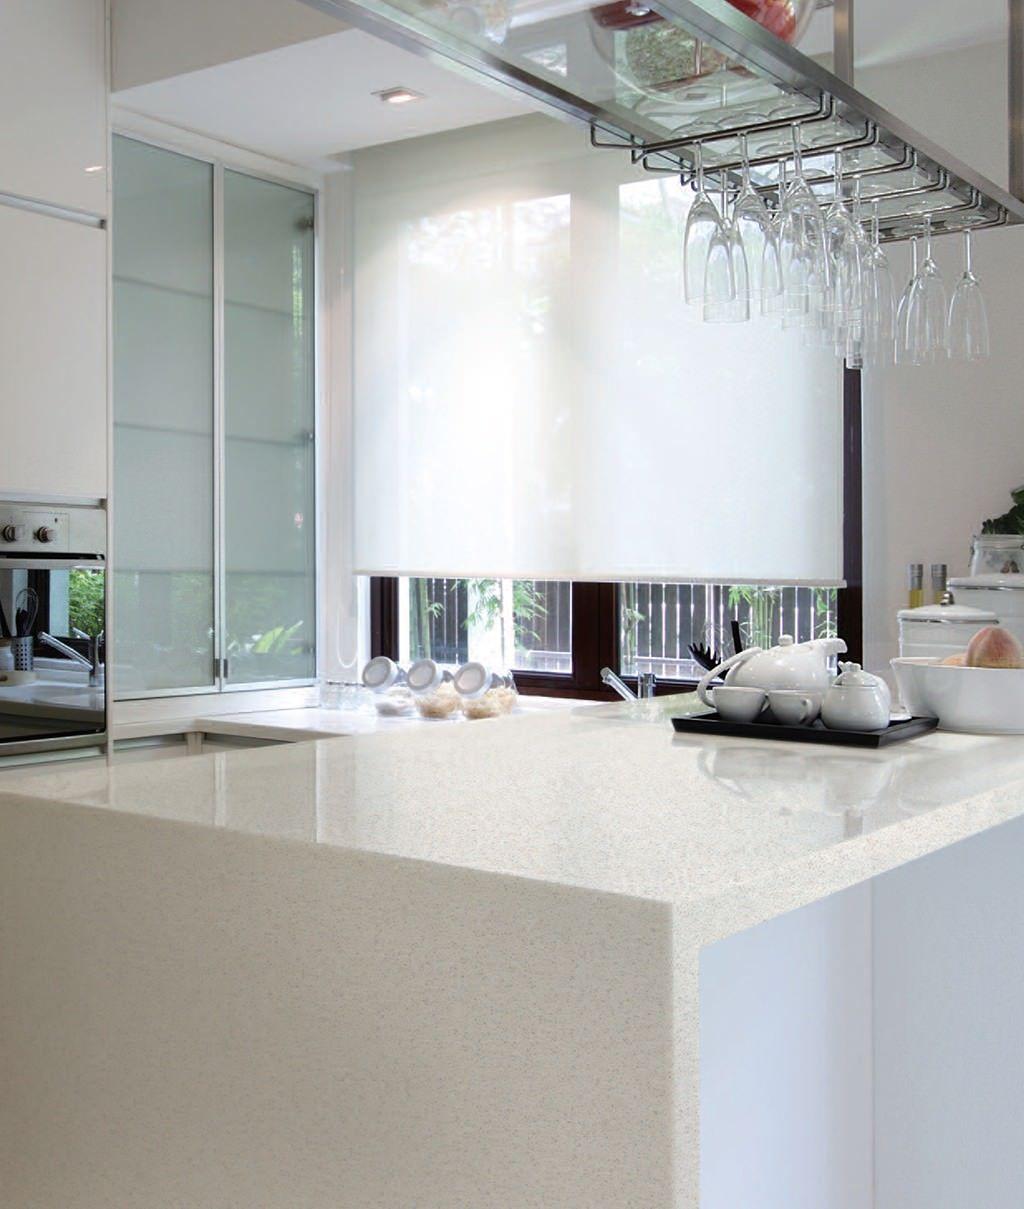 Modern kitchen with snow white quartz counter long peninsula and white - Countertop Viatera Modern Kitchen Ideas Denali Quartz Kitchen White Quartz Waterfall Edge